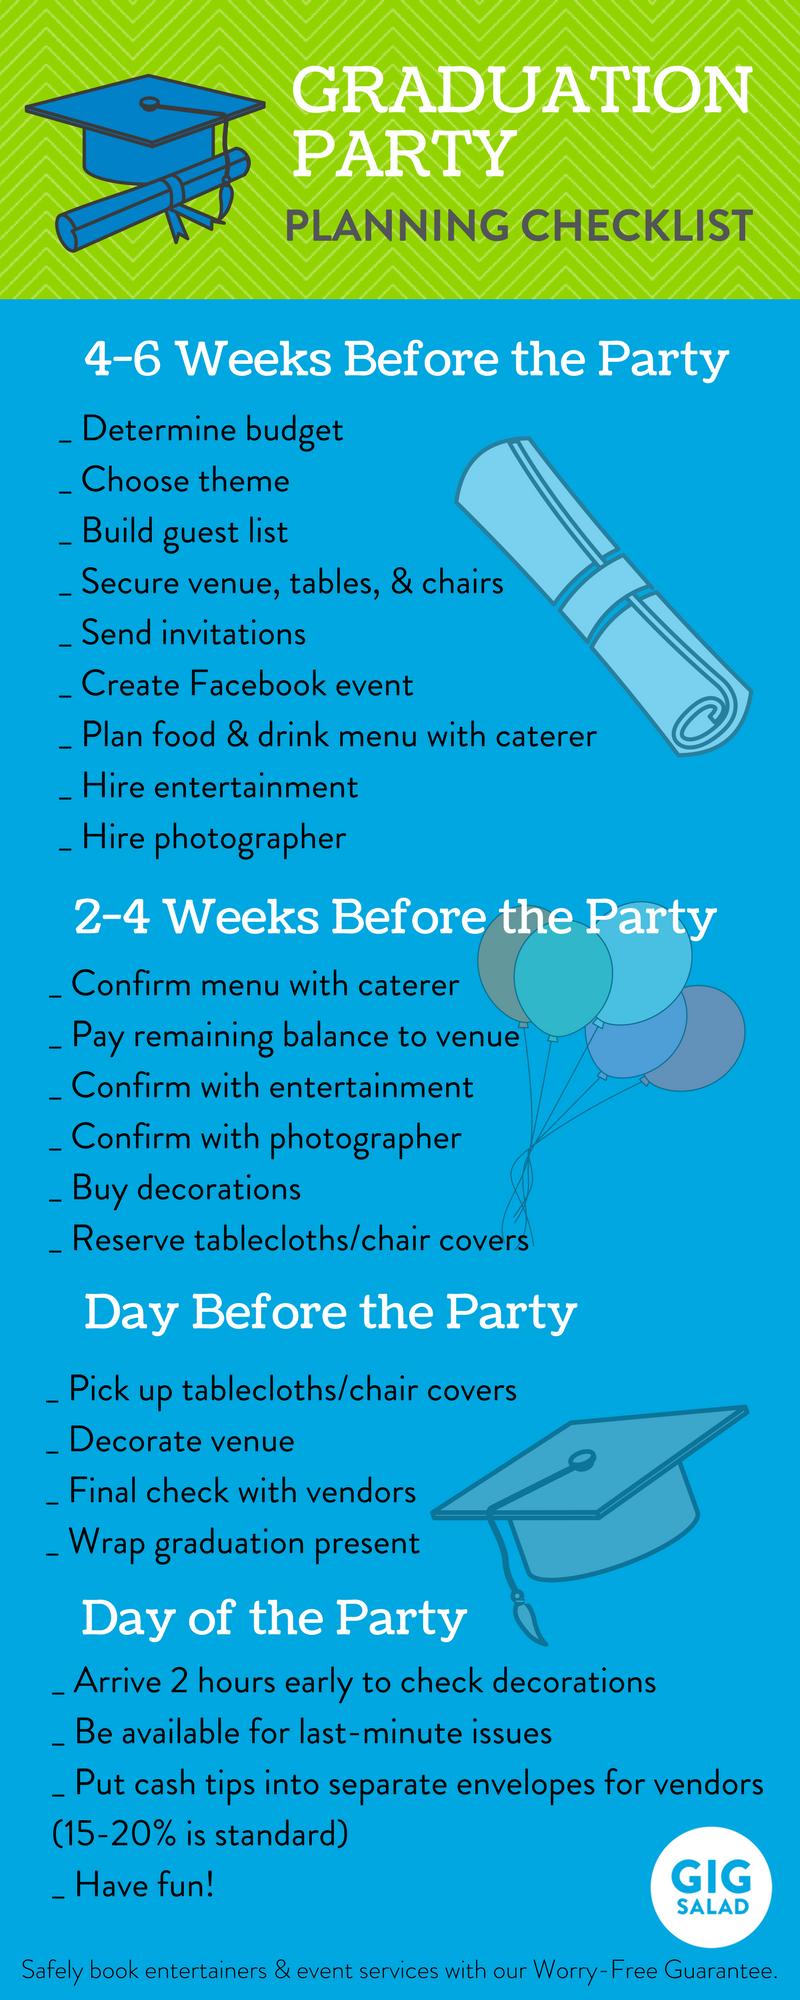 A Simple Graduation Party Checklist For Parents The